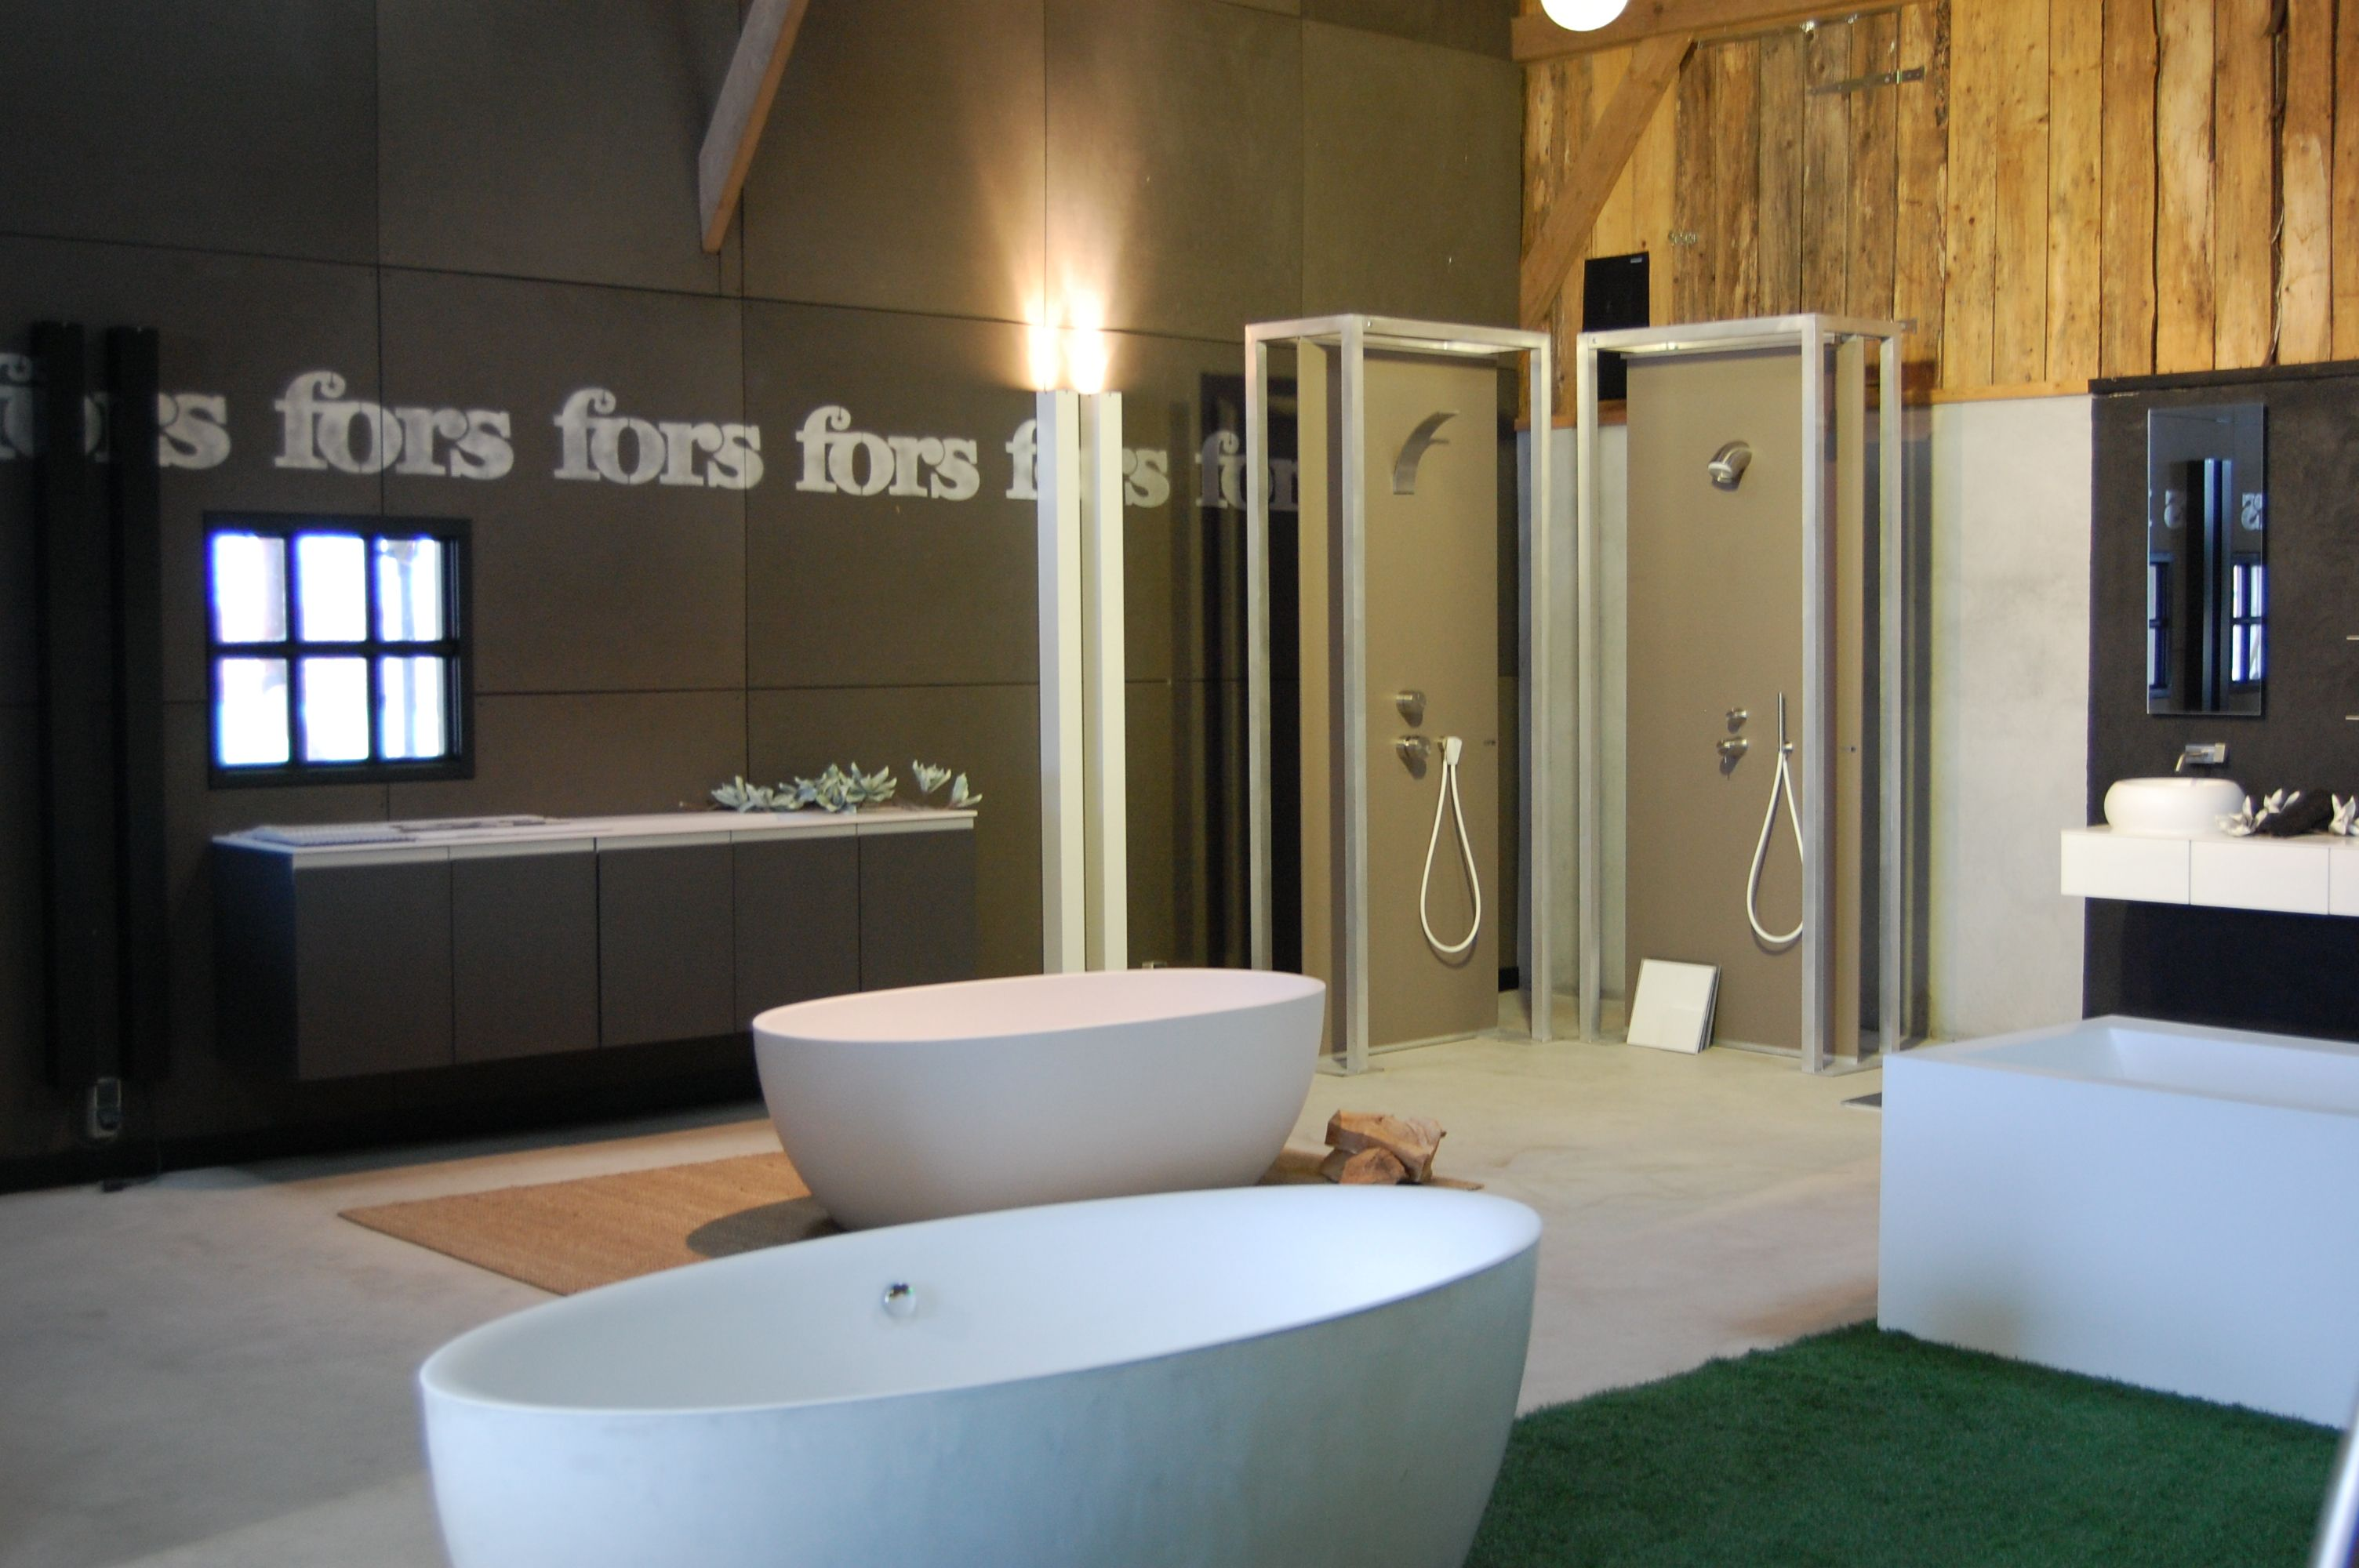 Design Badkamers Breda : Showroom fors design breda fors design badkamers